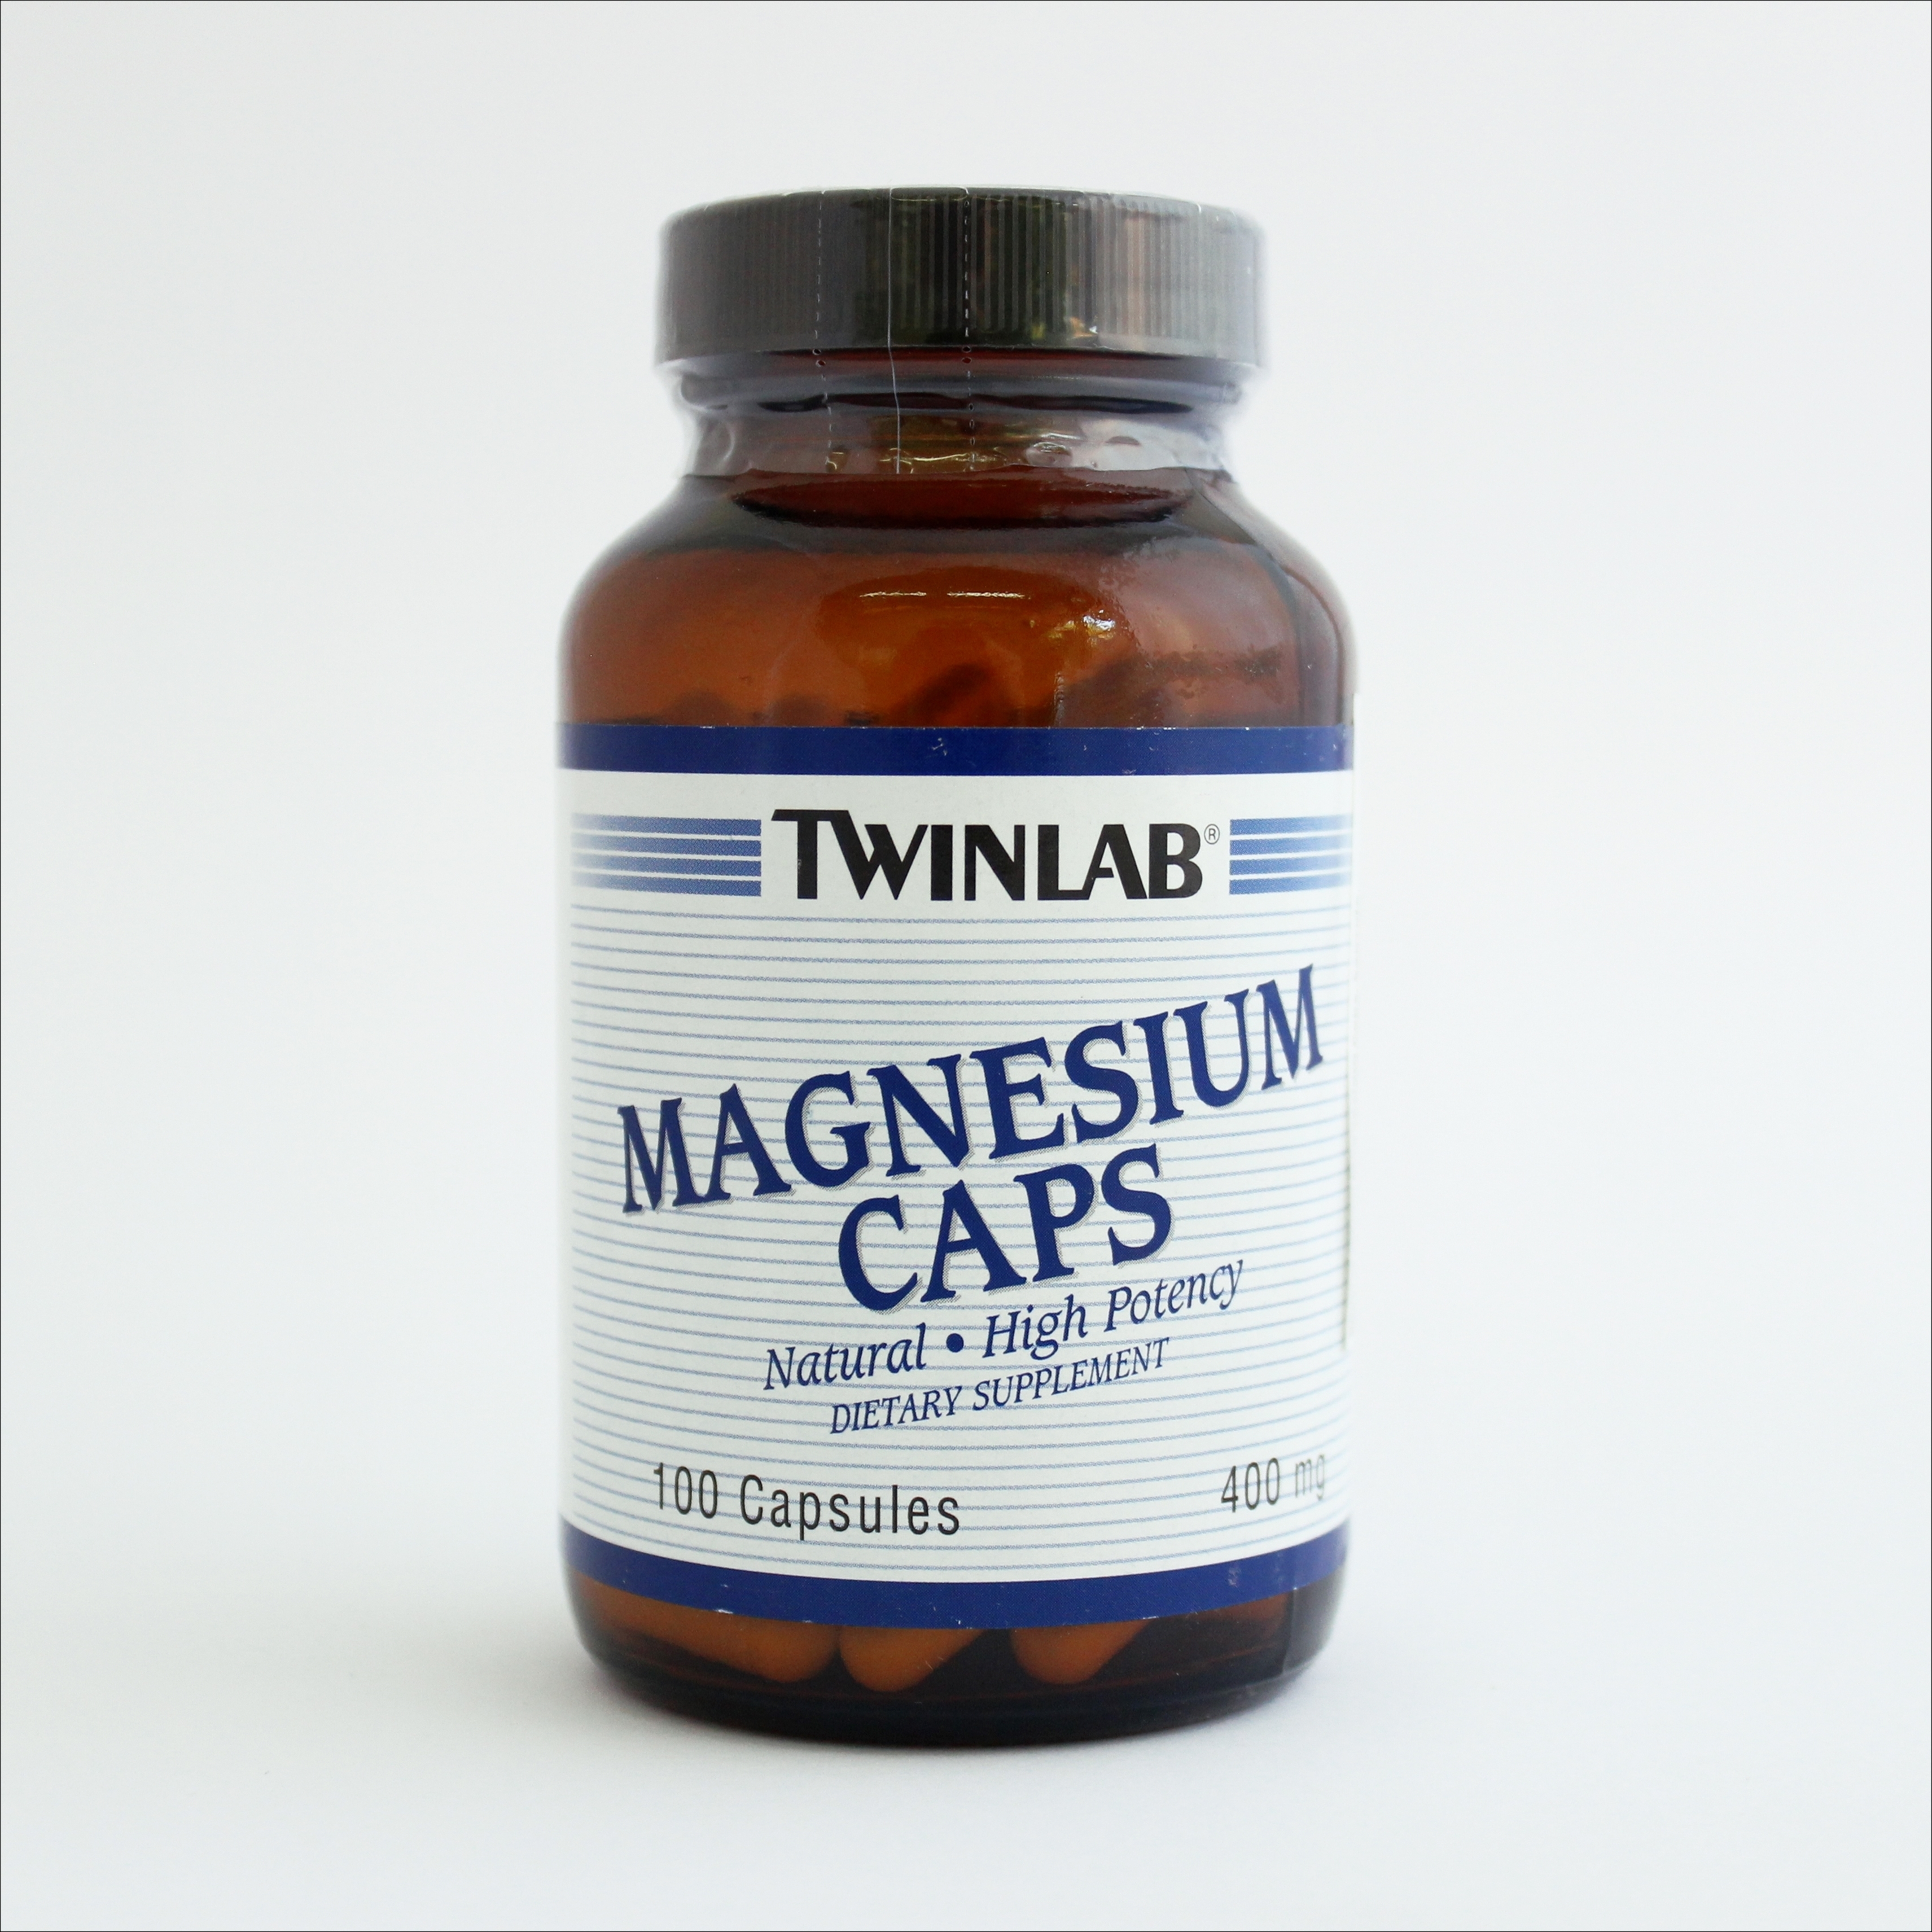 Twinlab Magnezijum 400 mg - 100 kapsula 00224